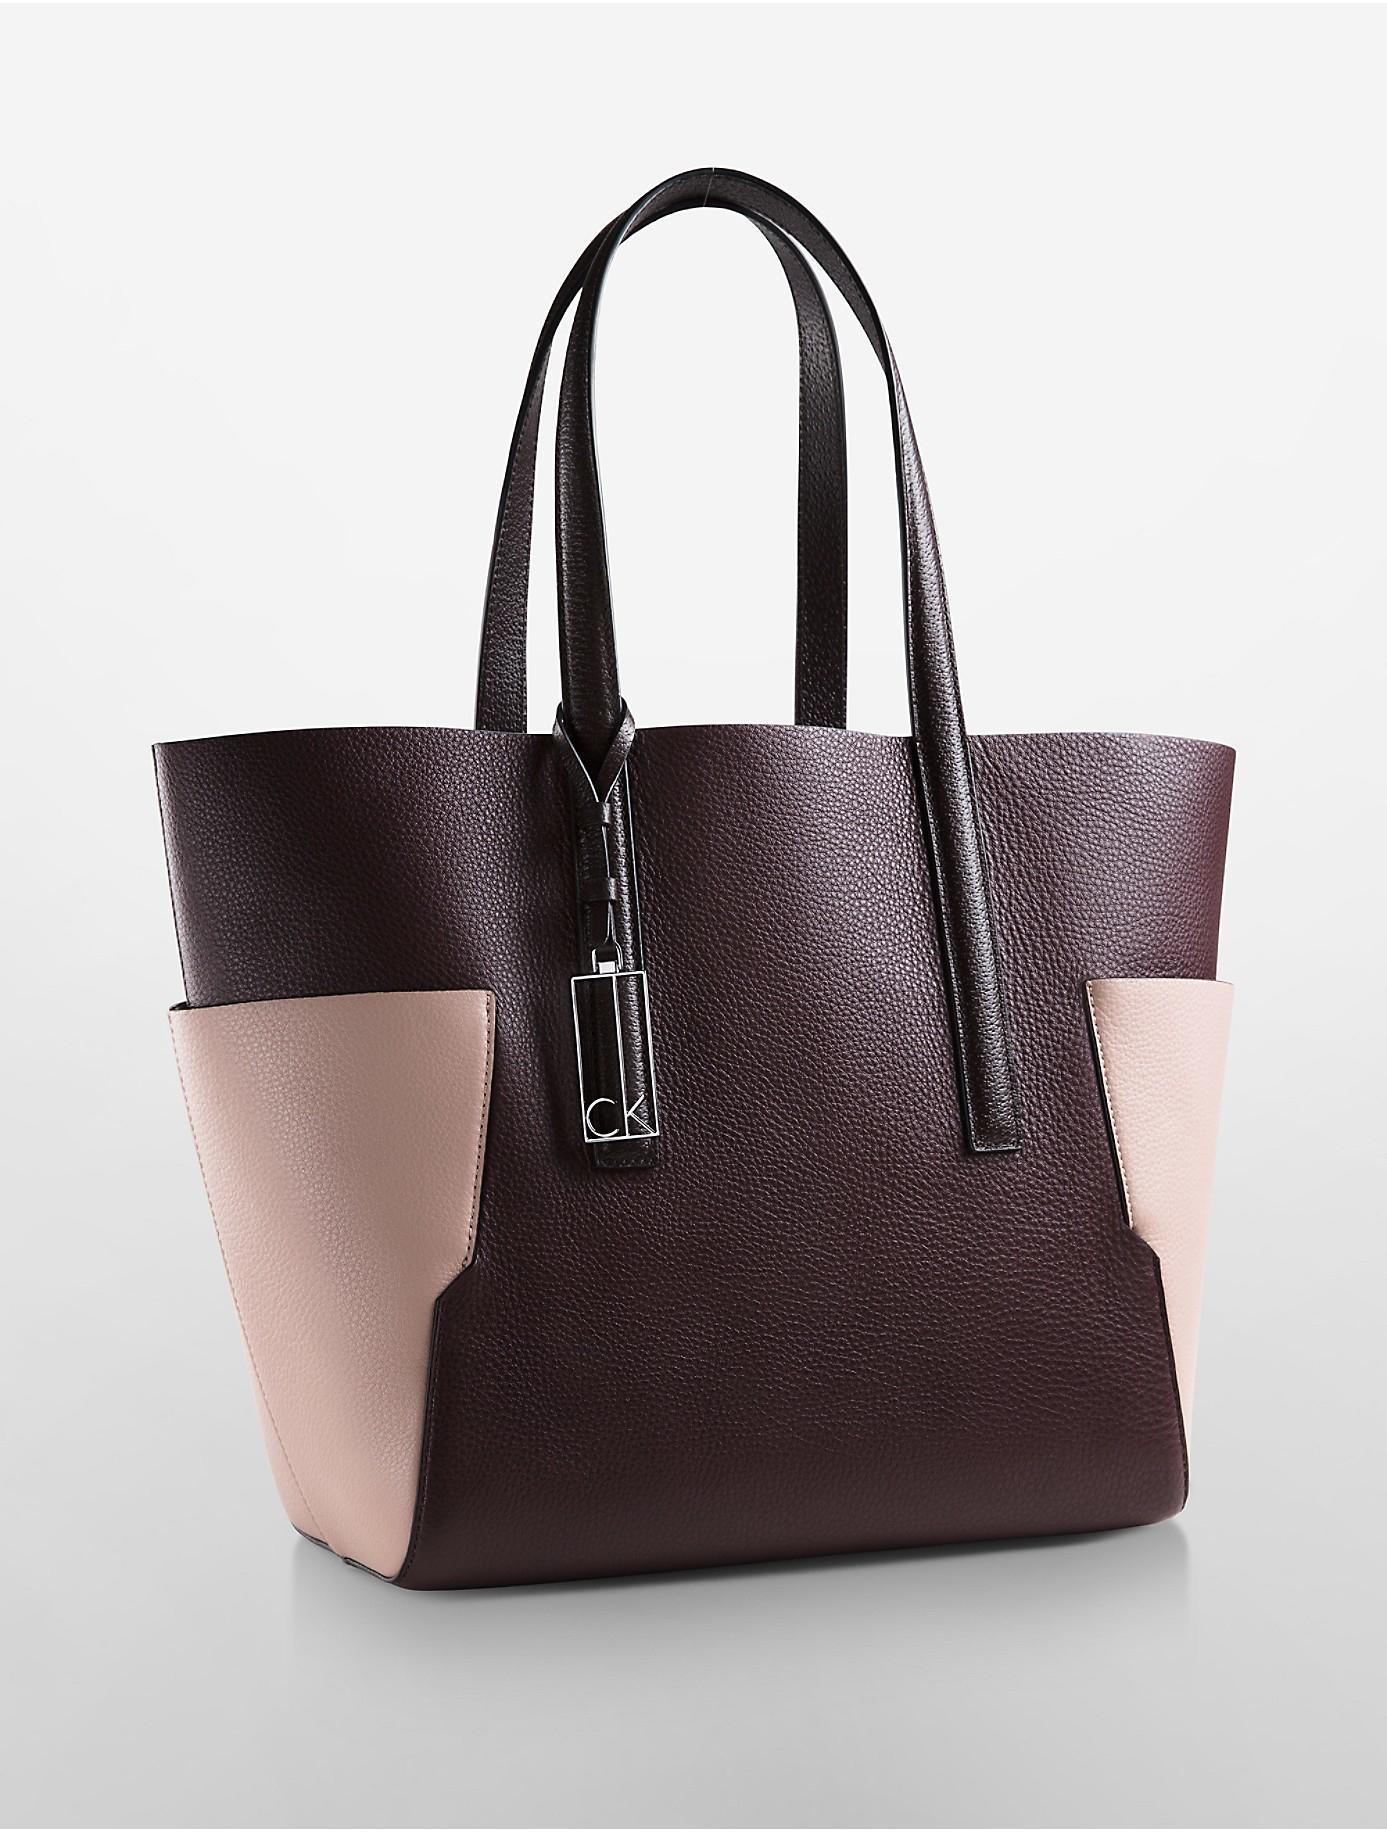 calvin klein arslyne colorblock leather shopper tote in. Black Bedroom Furniture Sets. Home Design Ideas